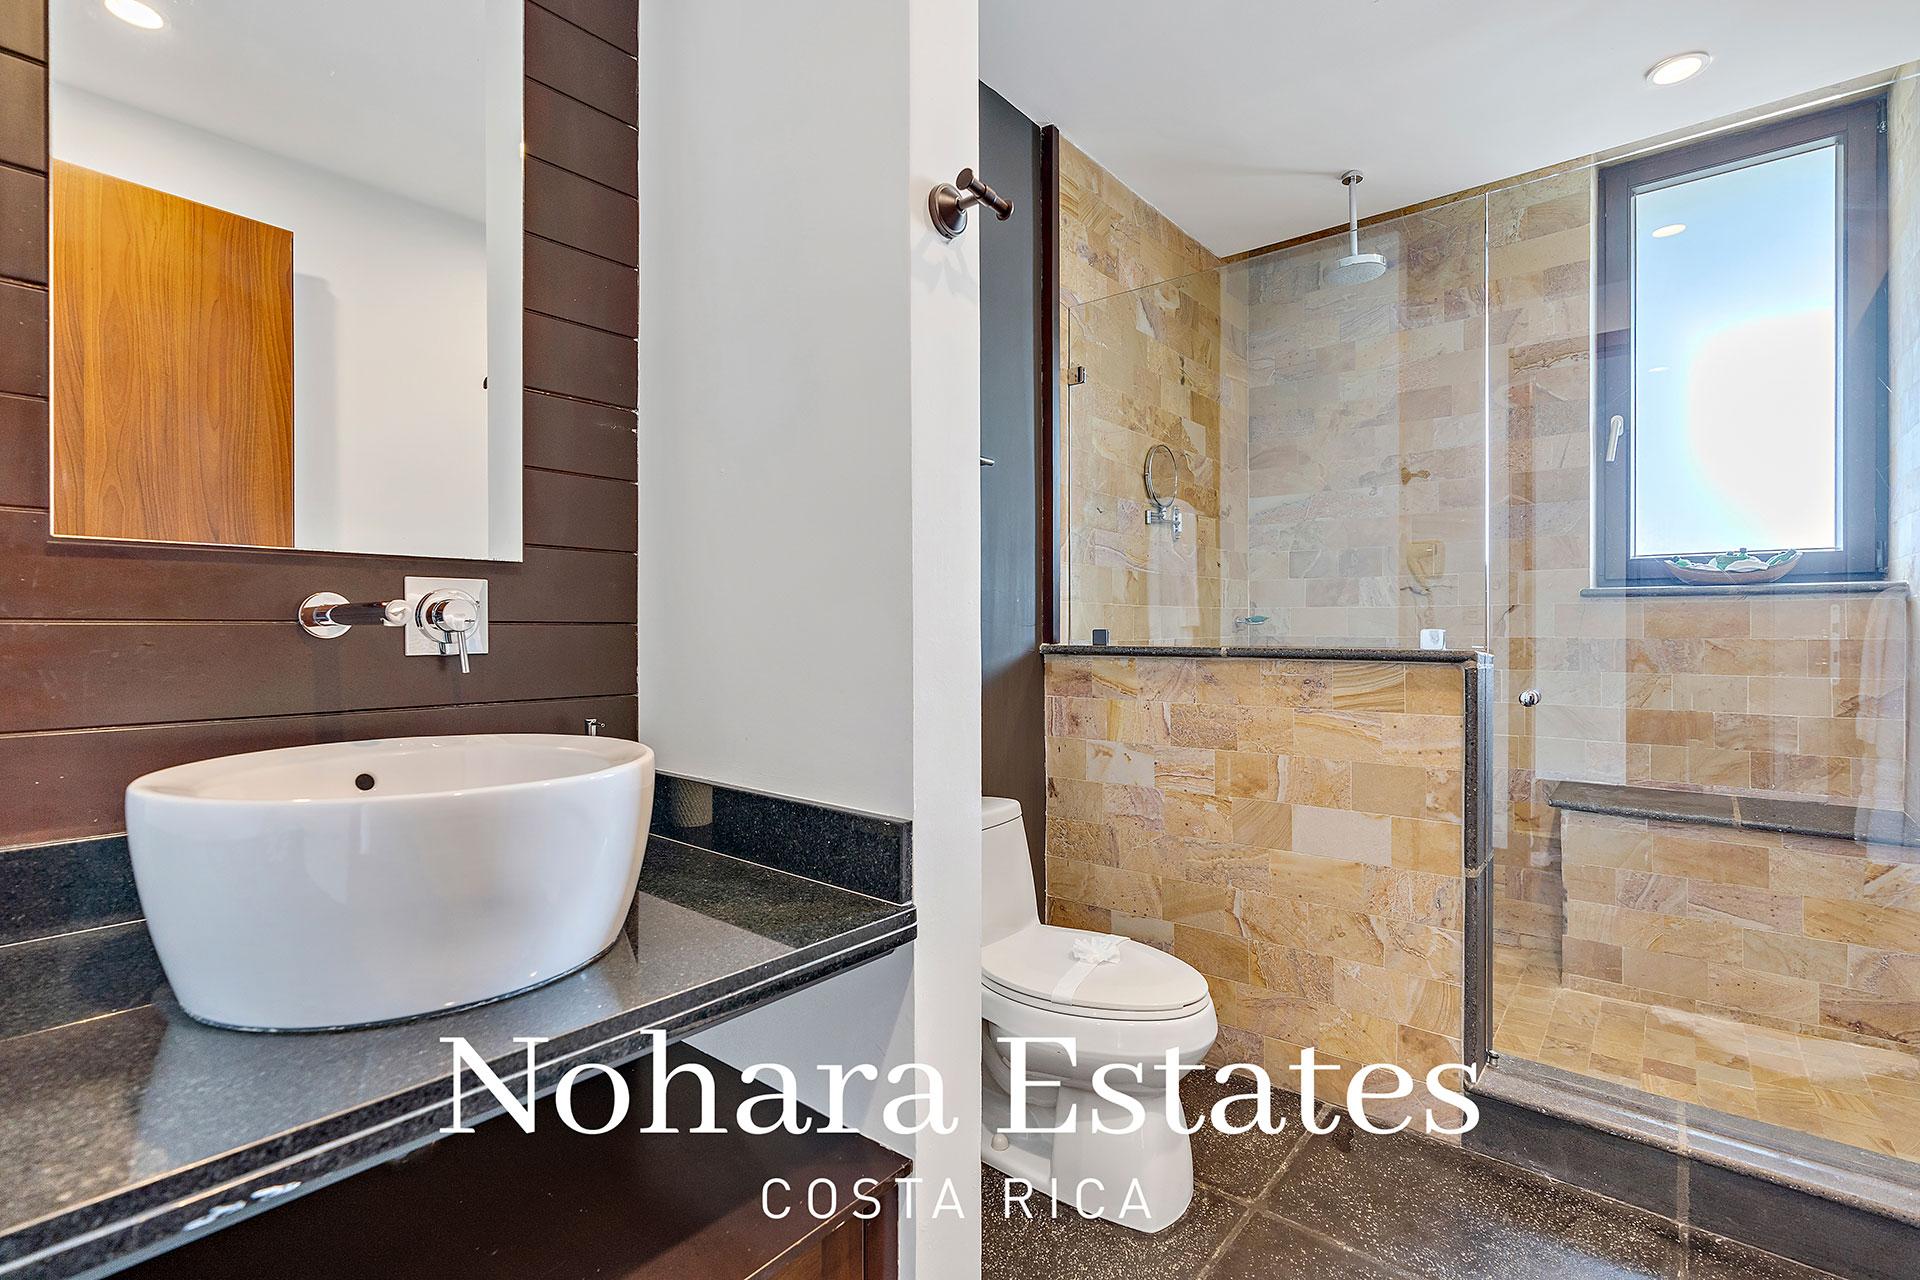 Nohara Estates Costa Rica 125 Apartment Quepos Los Altos 1